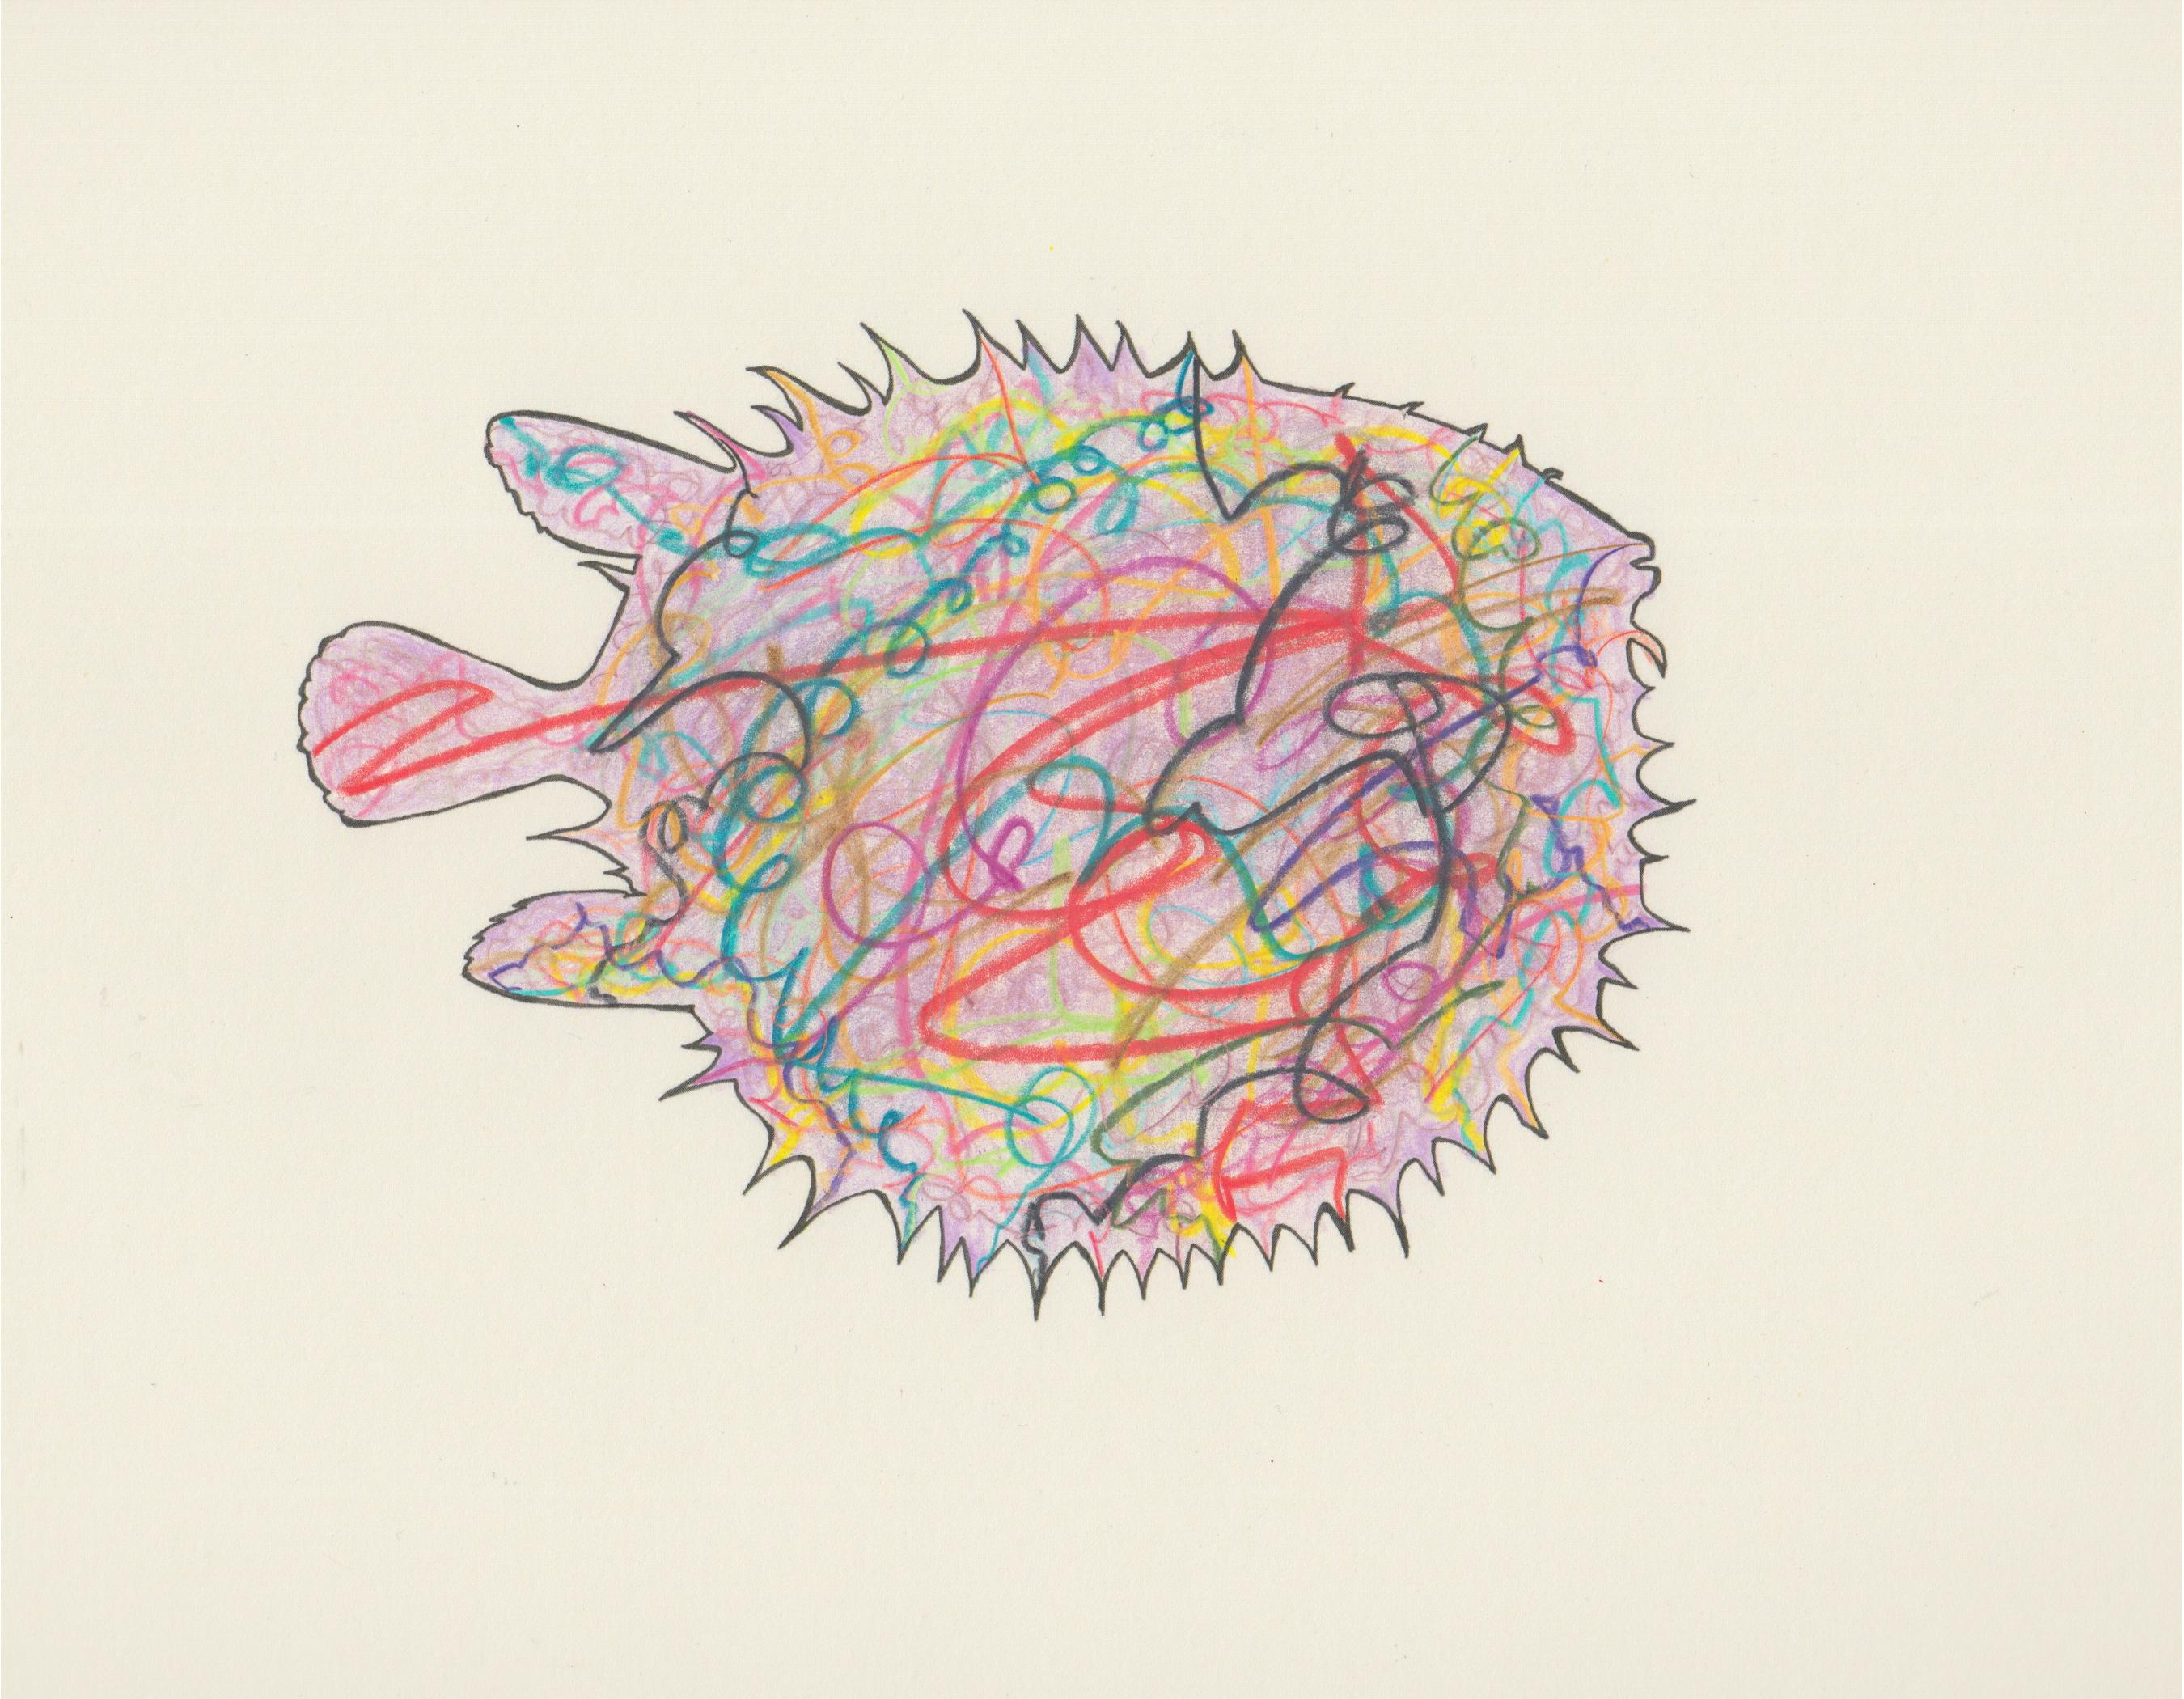 Electirc Blowfish